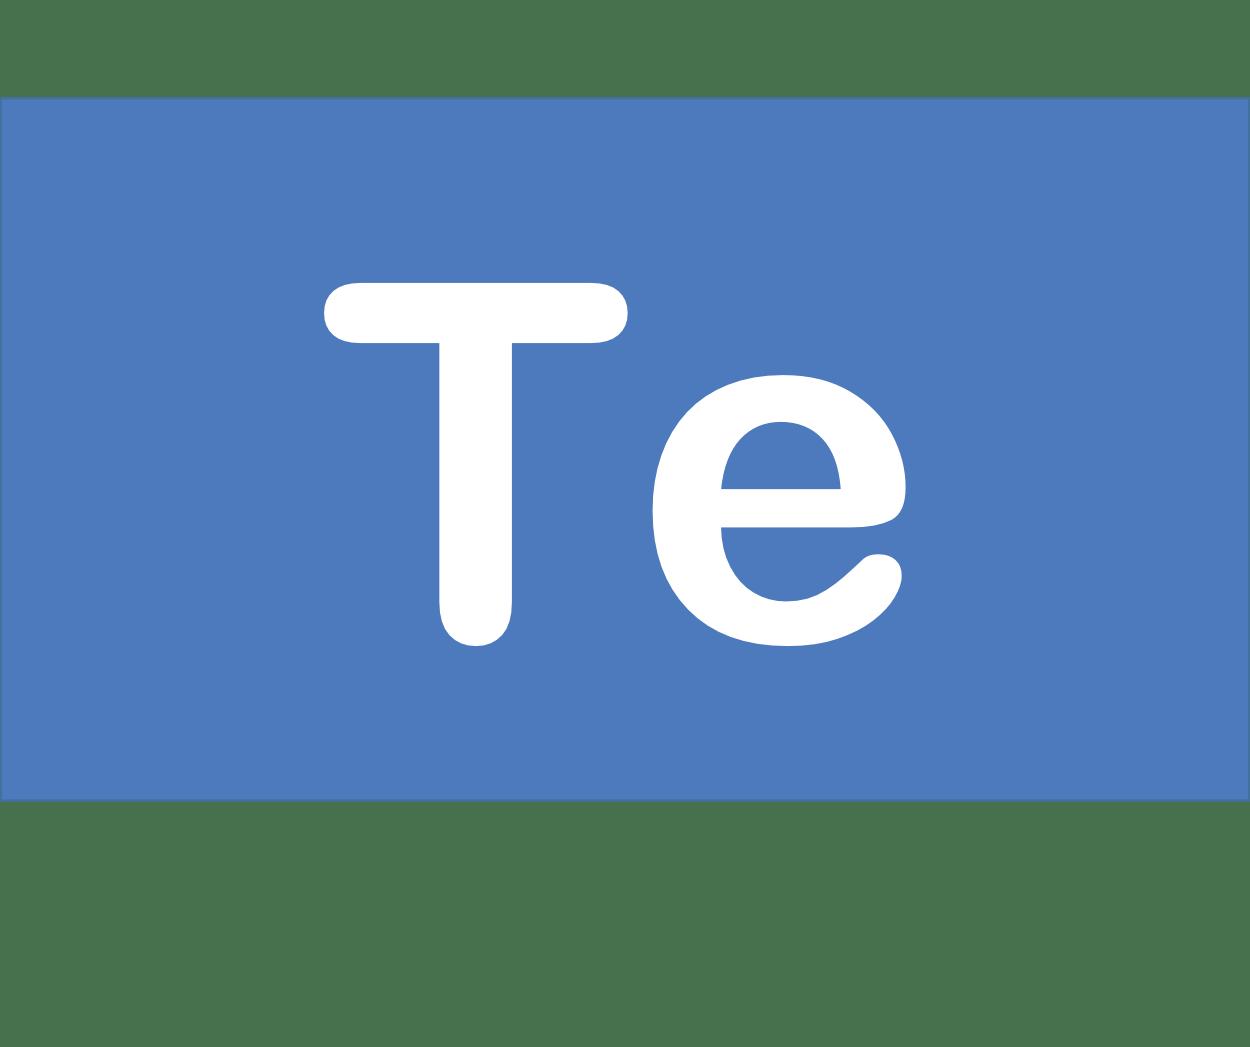 52 Te テルル Tellurium 元素 記号 周期表 化学 原子